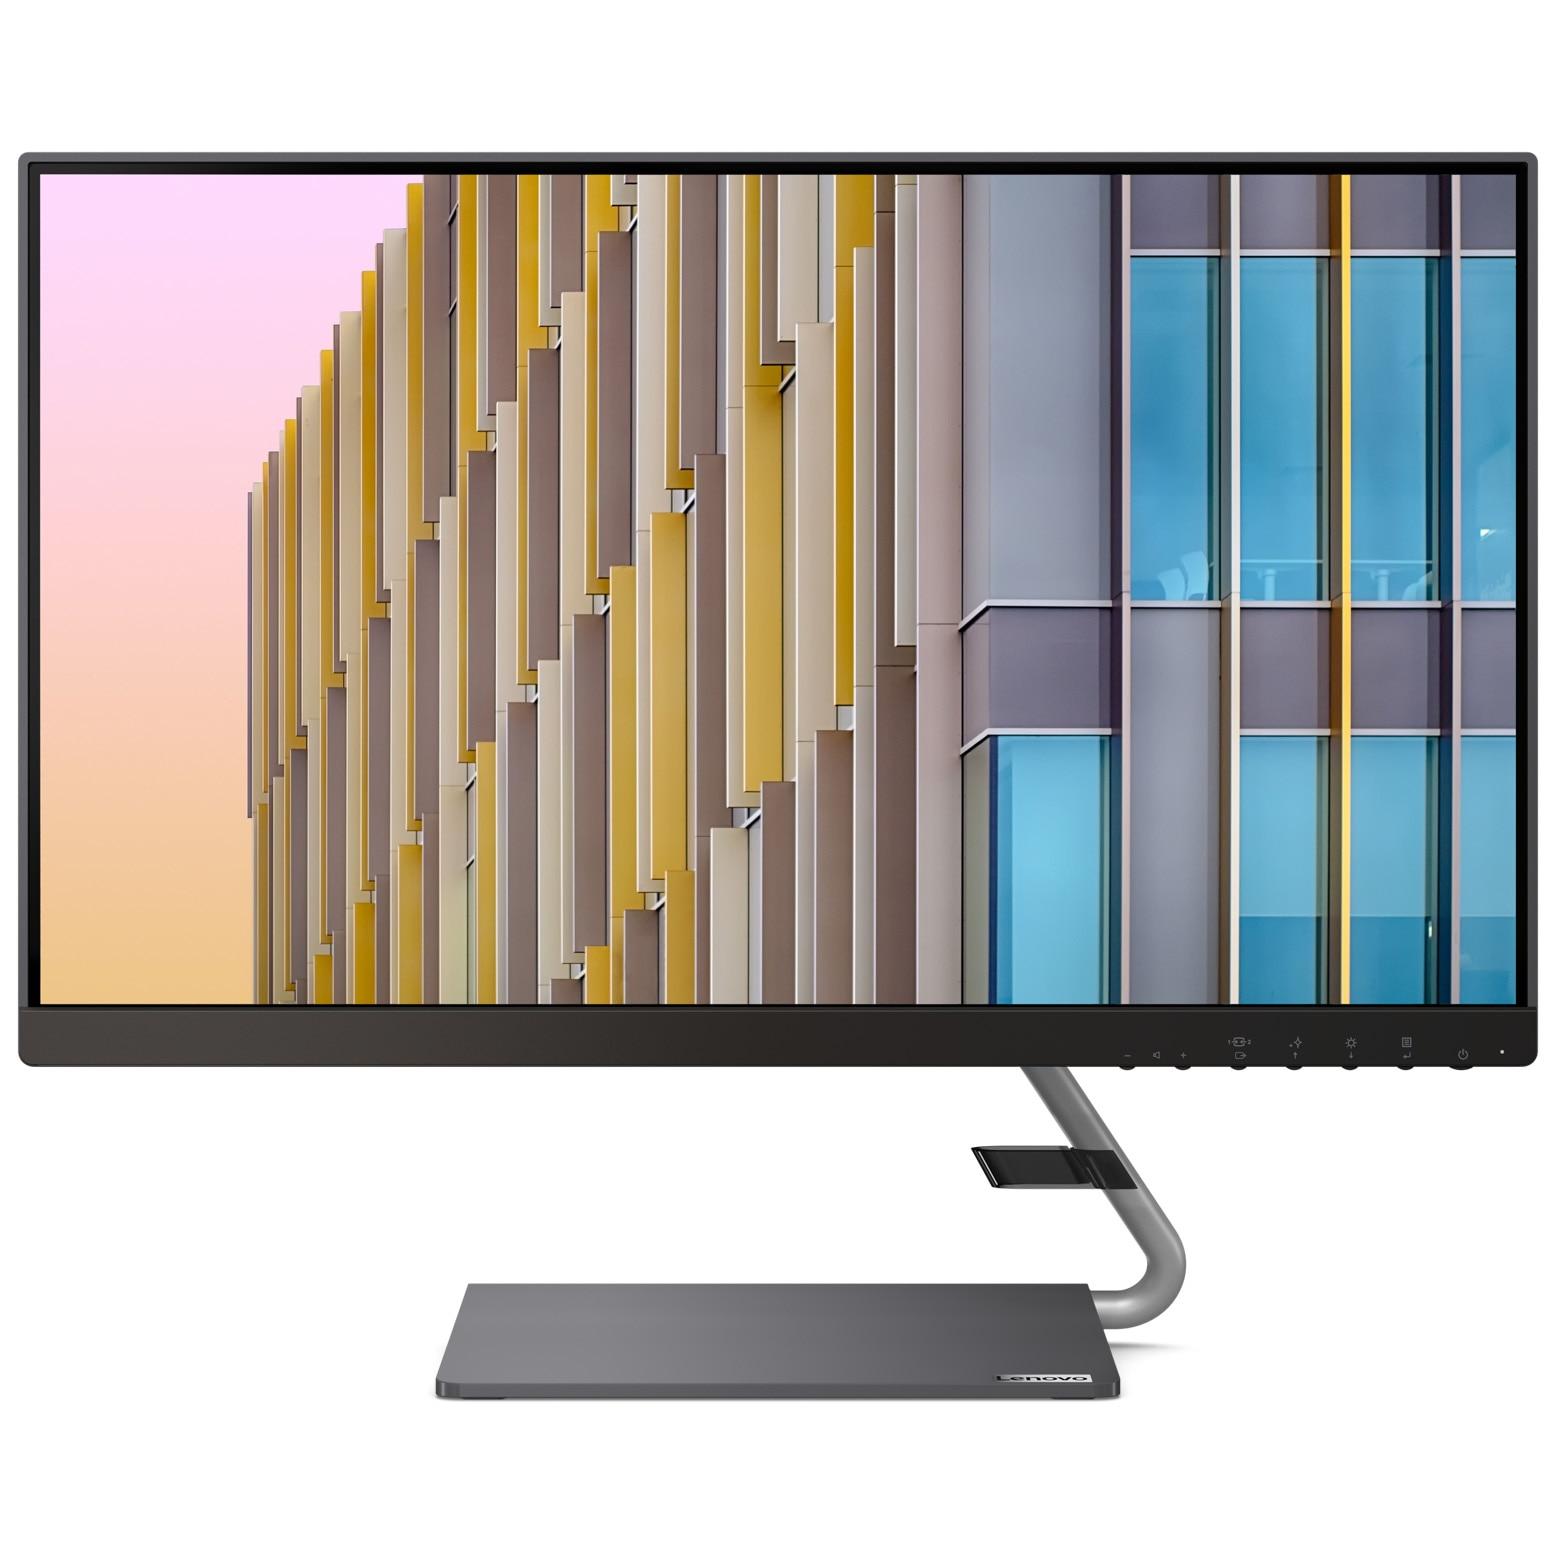 "Fotografie Monitor LED IPS Lenovo, 23.8"", 75 Hz, 4 ms ,HDMI+USB Type-C 3-side borderless with speakers (2 x 3W) - Raven Black / Iron Grey Stand, Q24h-10"